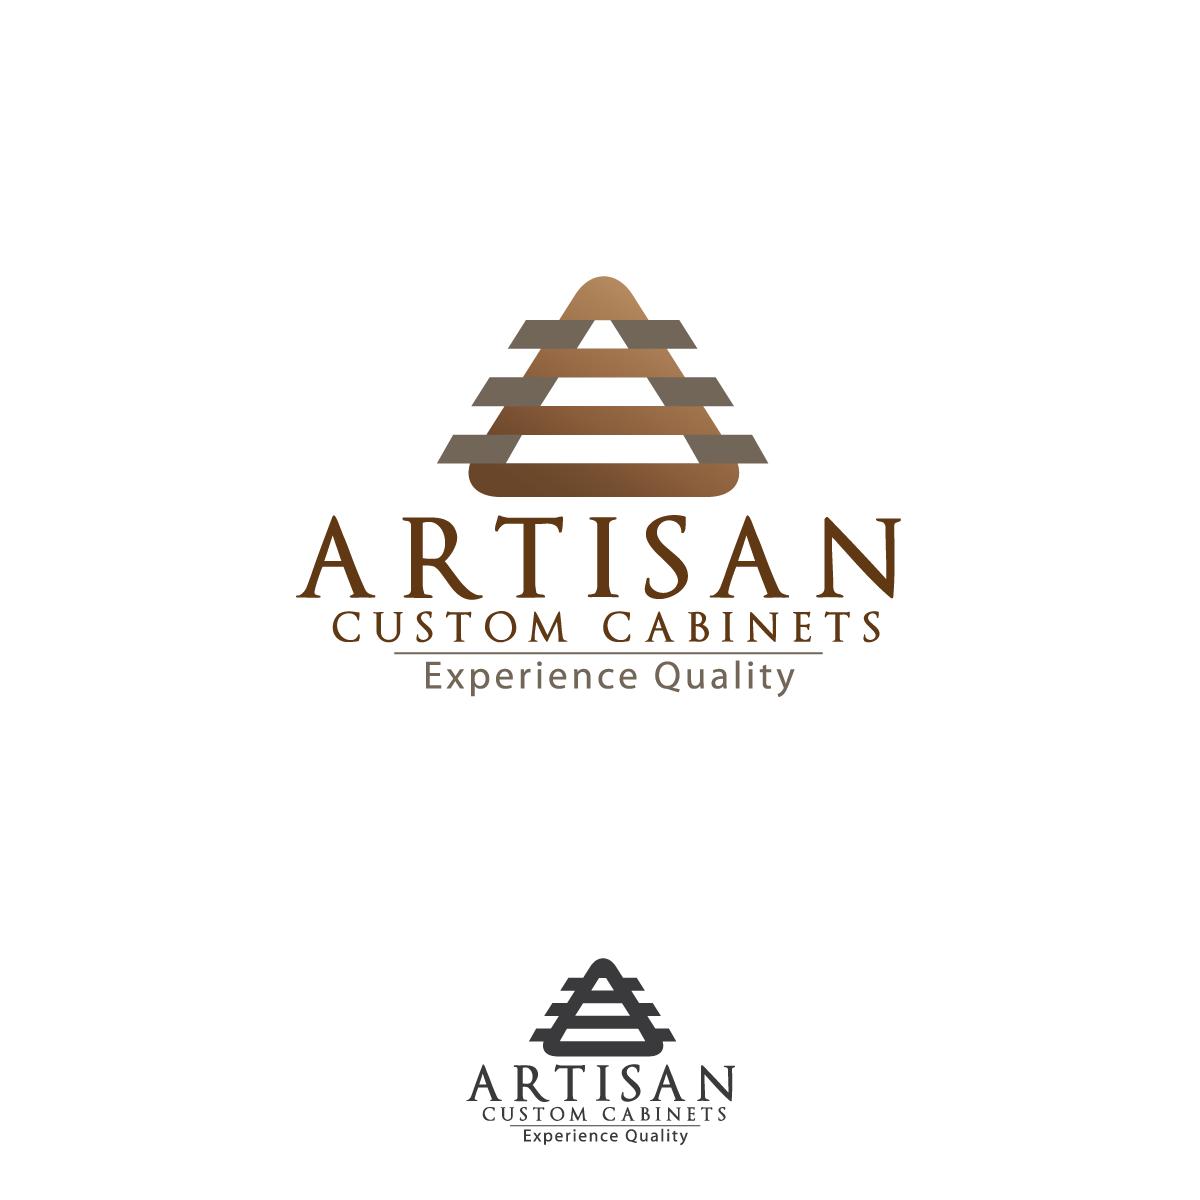 Logo Design by rockin - Entry No. 69 in the Logo Design Contest Creative Logo Design for Artisan Custom Cabinets.